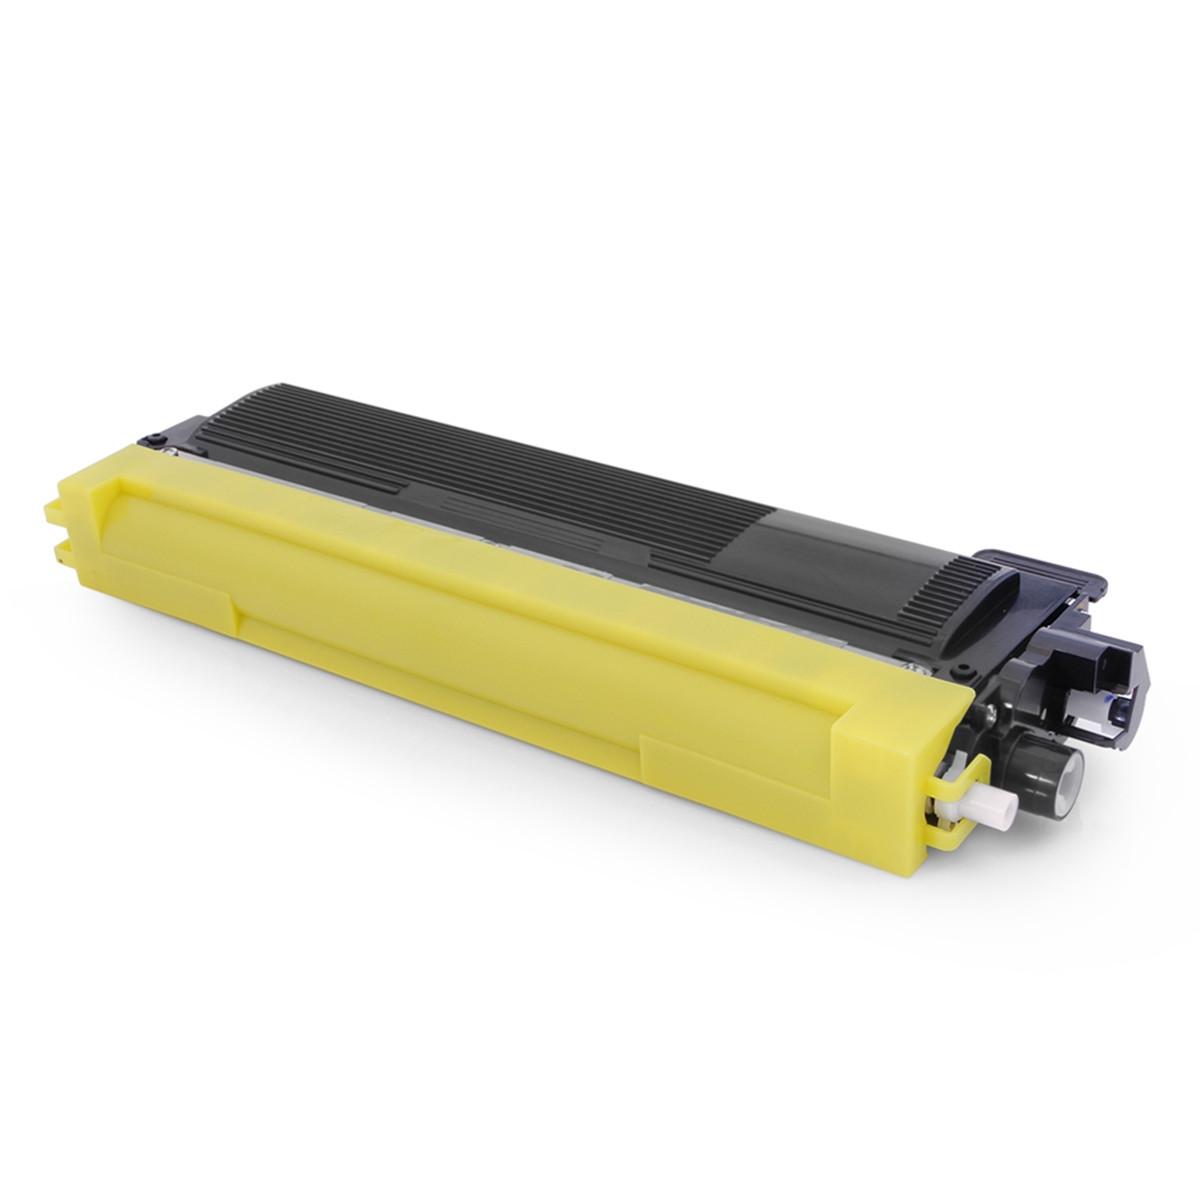 Toner Compatível com Brother TN230 TN230C Ciano | MFC9010CN MFC9320CW HL3040CN HL8070 | Premium 1.4k